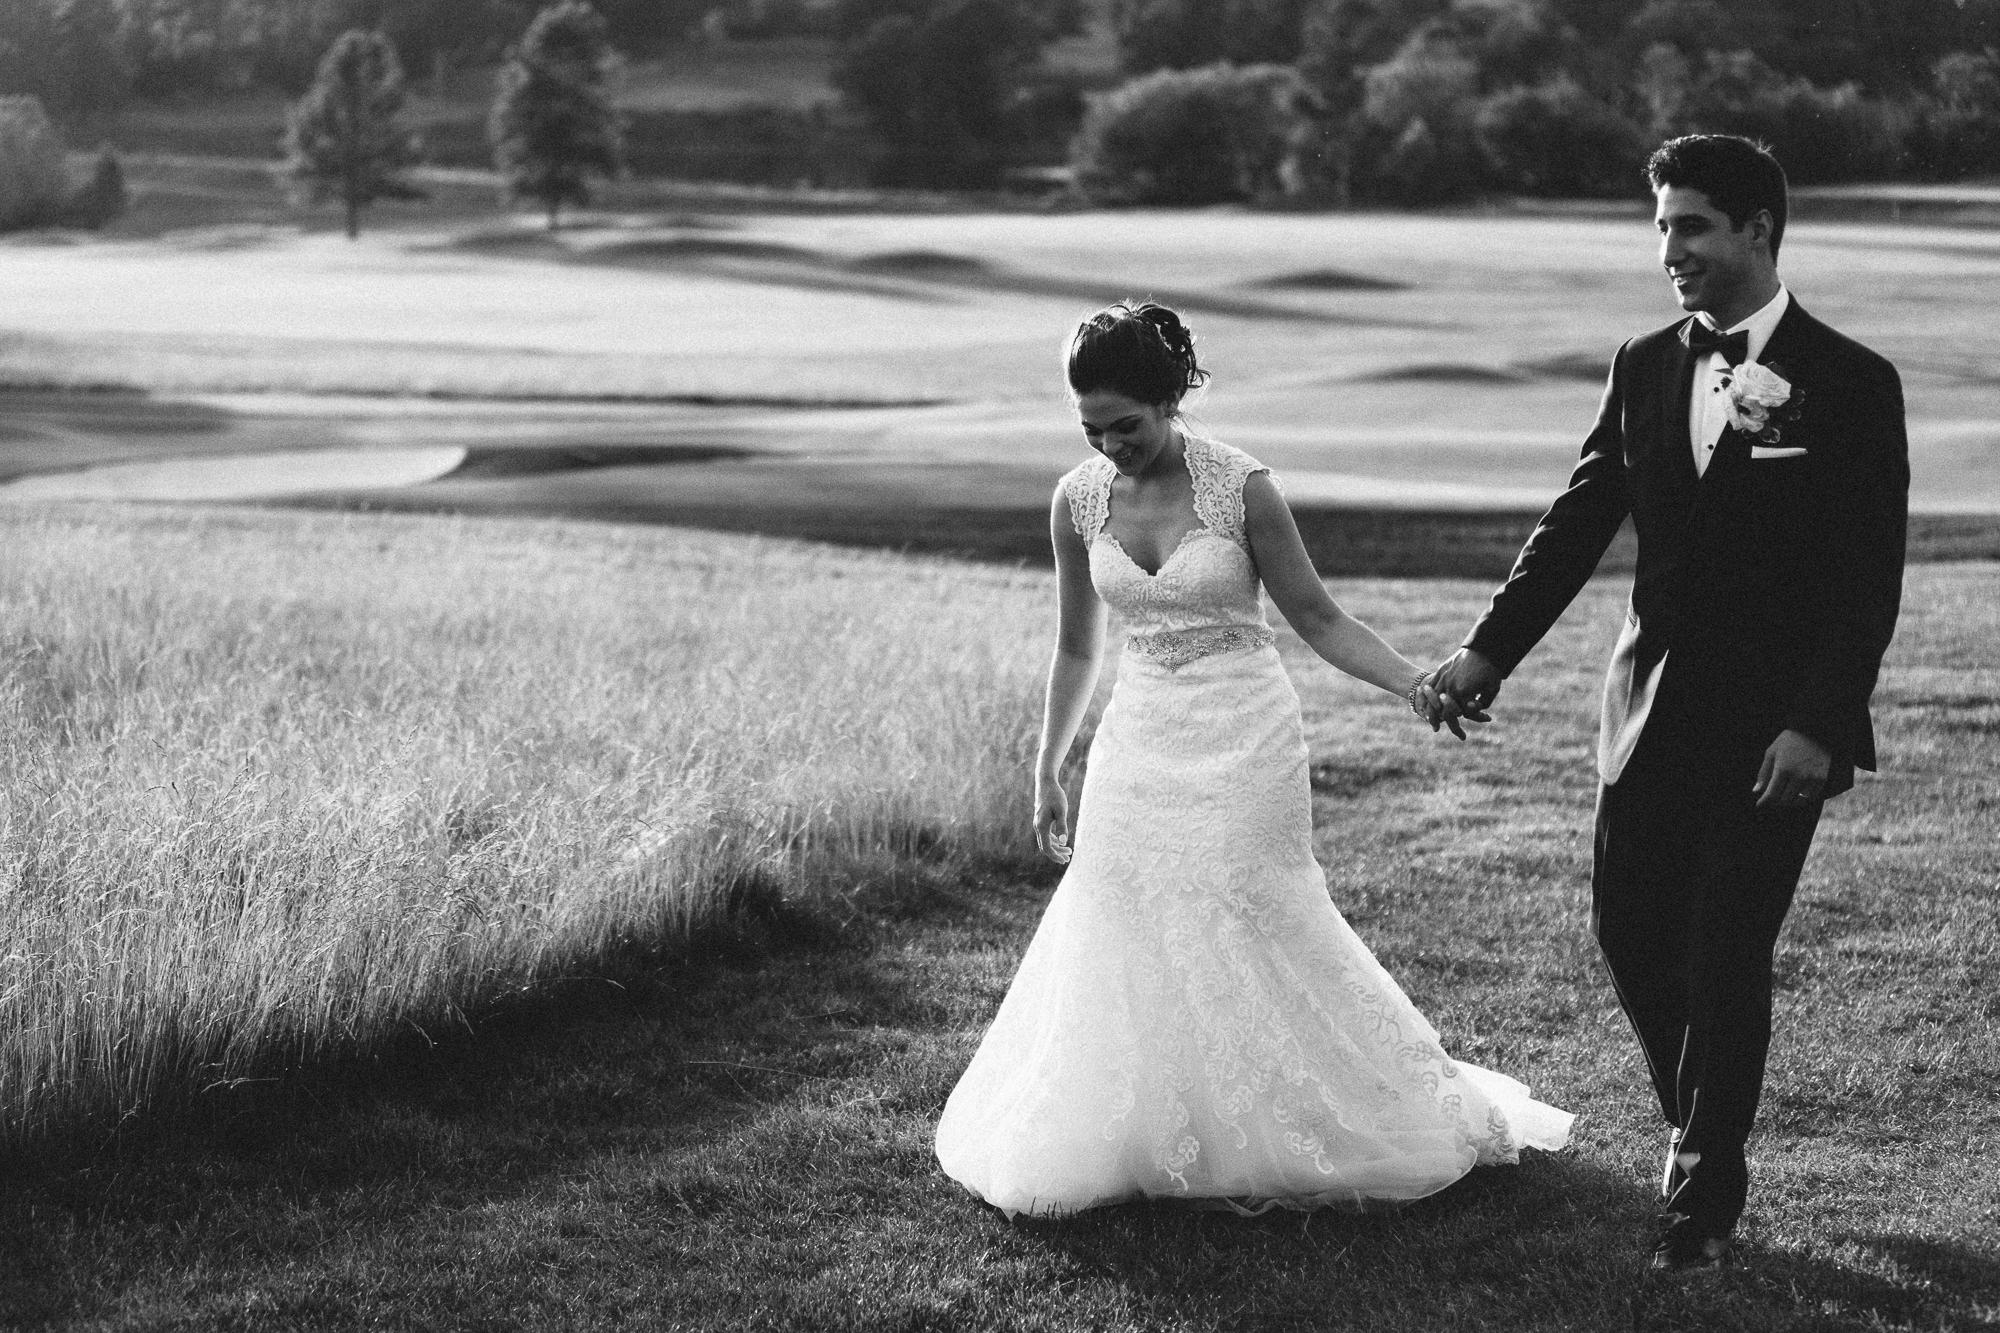 scranton-wedding-photography-zak-zavada-2016.06-rebeccaIan-1896.jpg